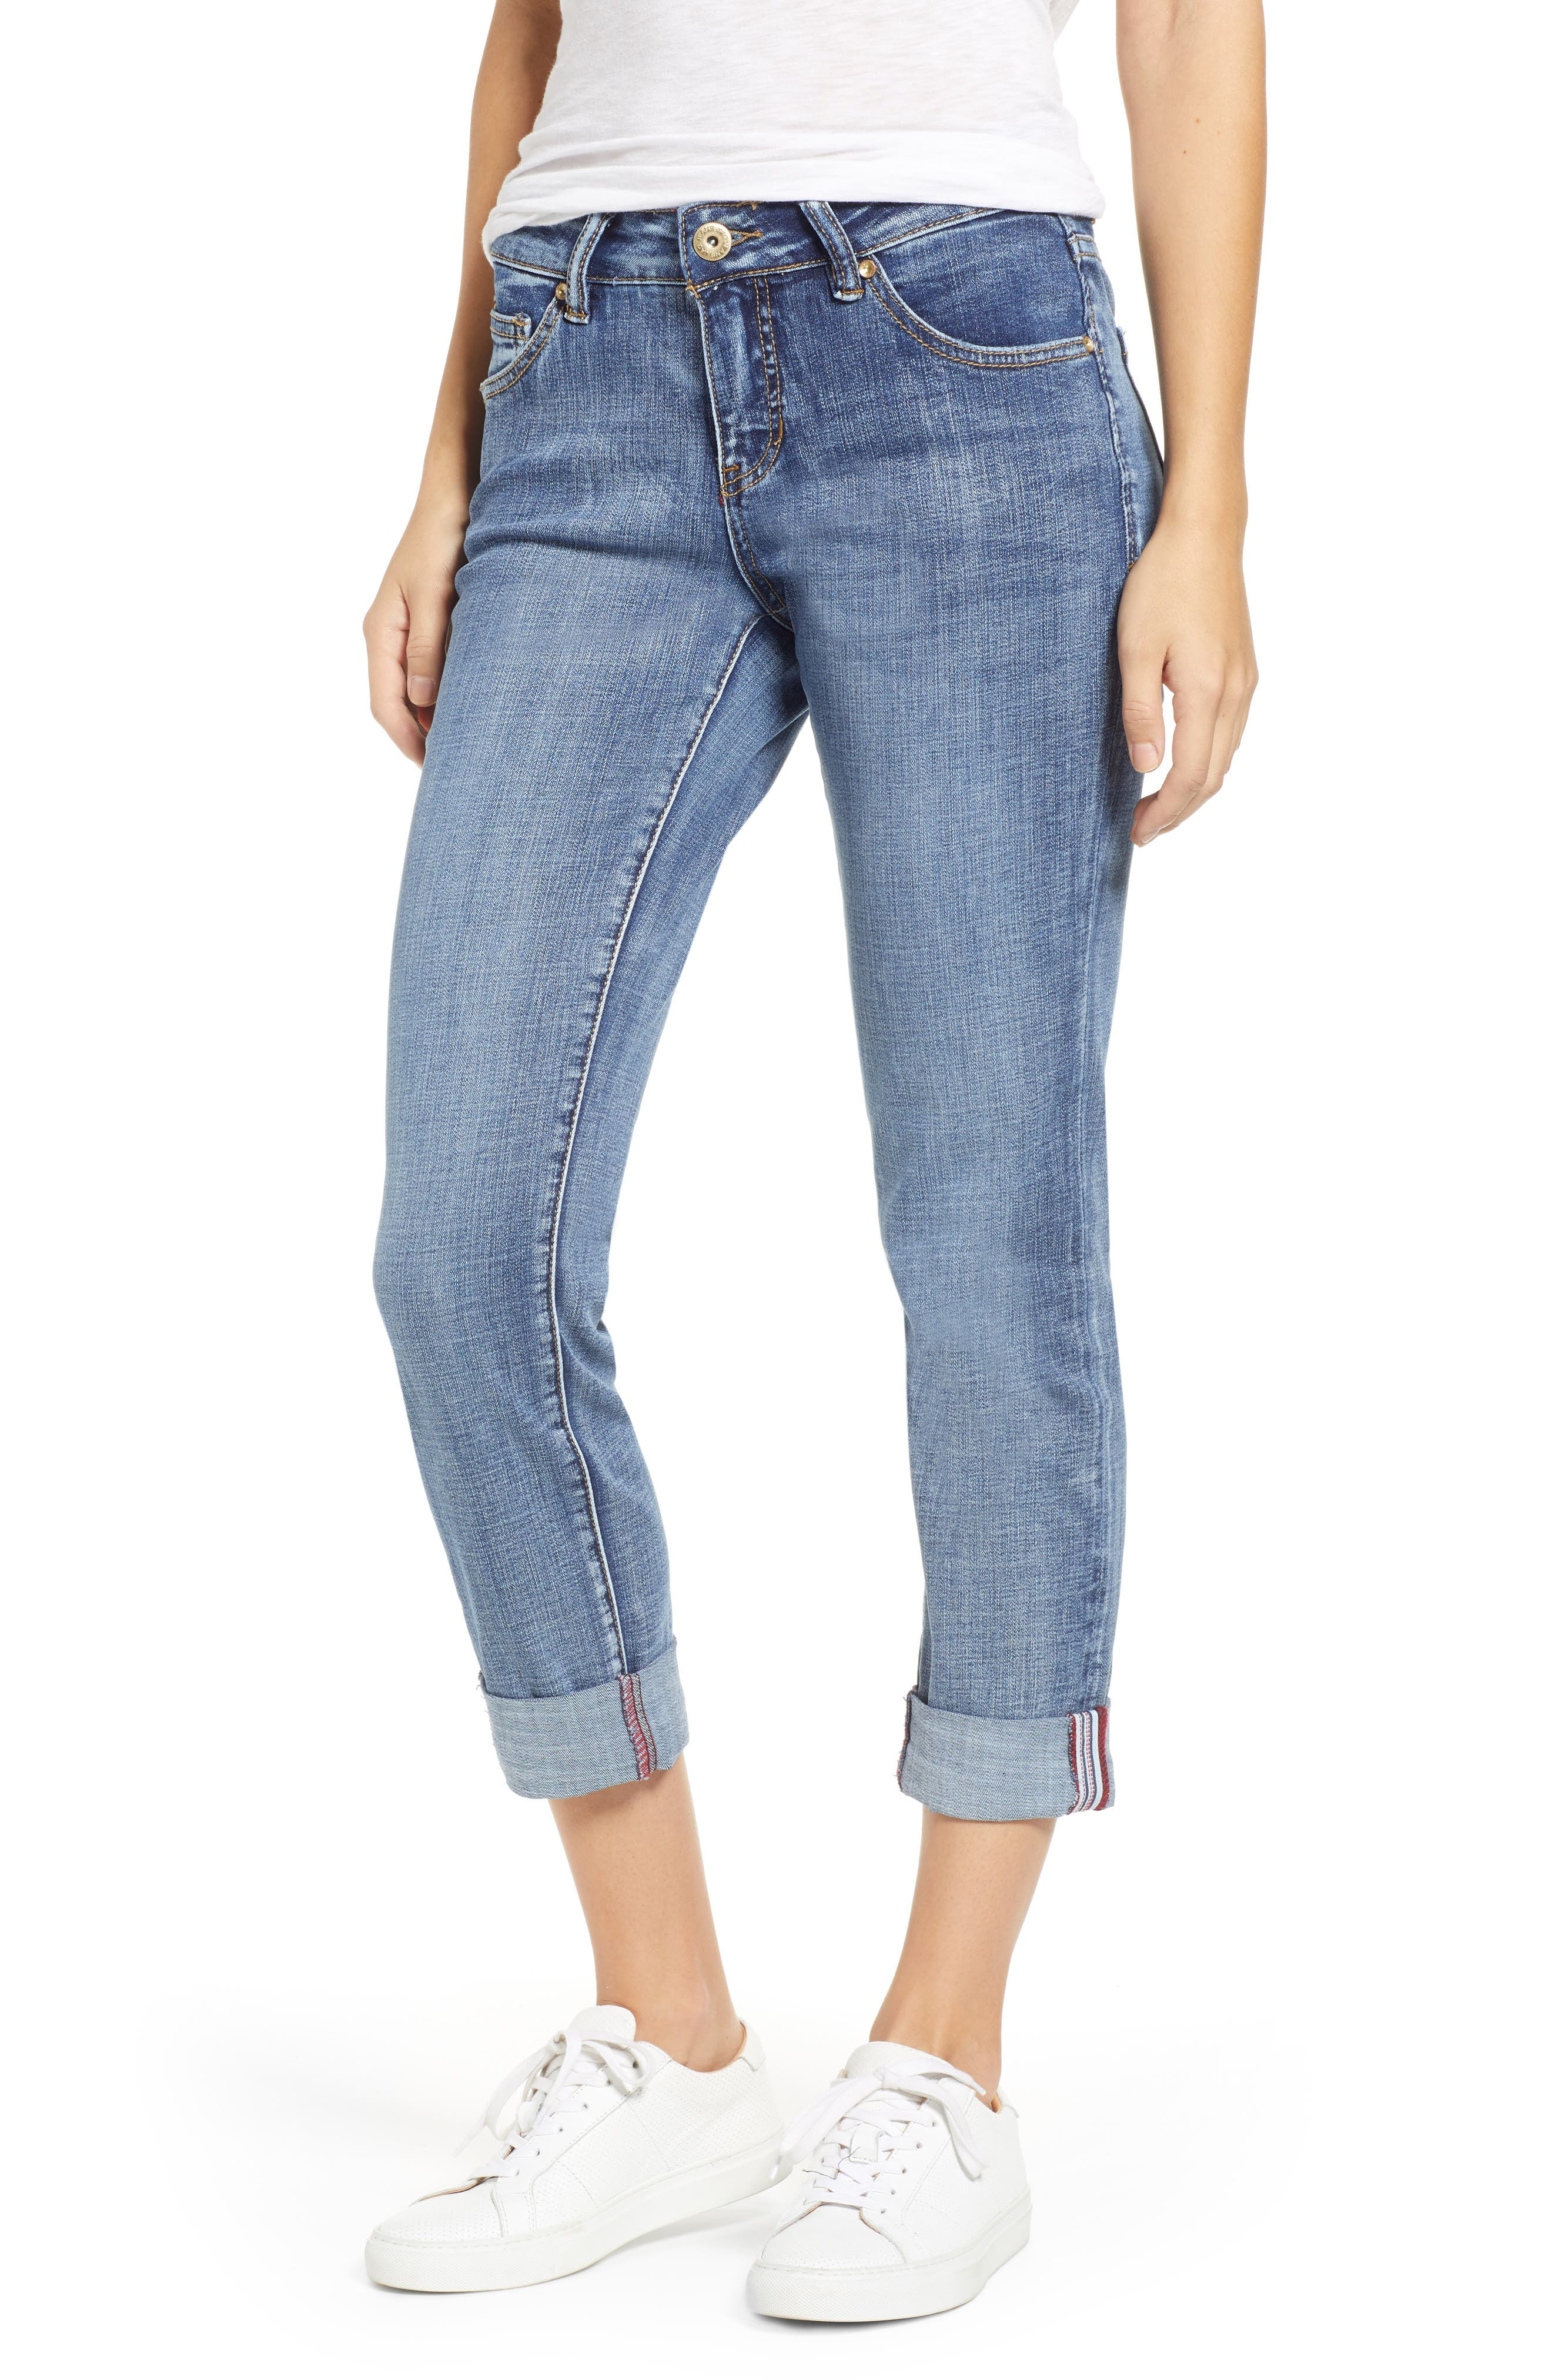 JAG JEANS Carter Girlfriend Jeans, Main, color, MED INDIGO